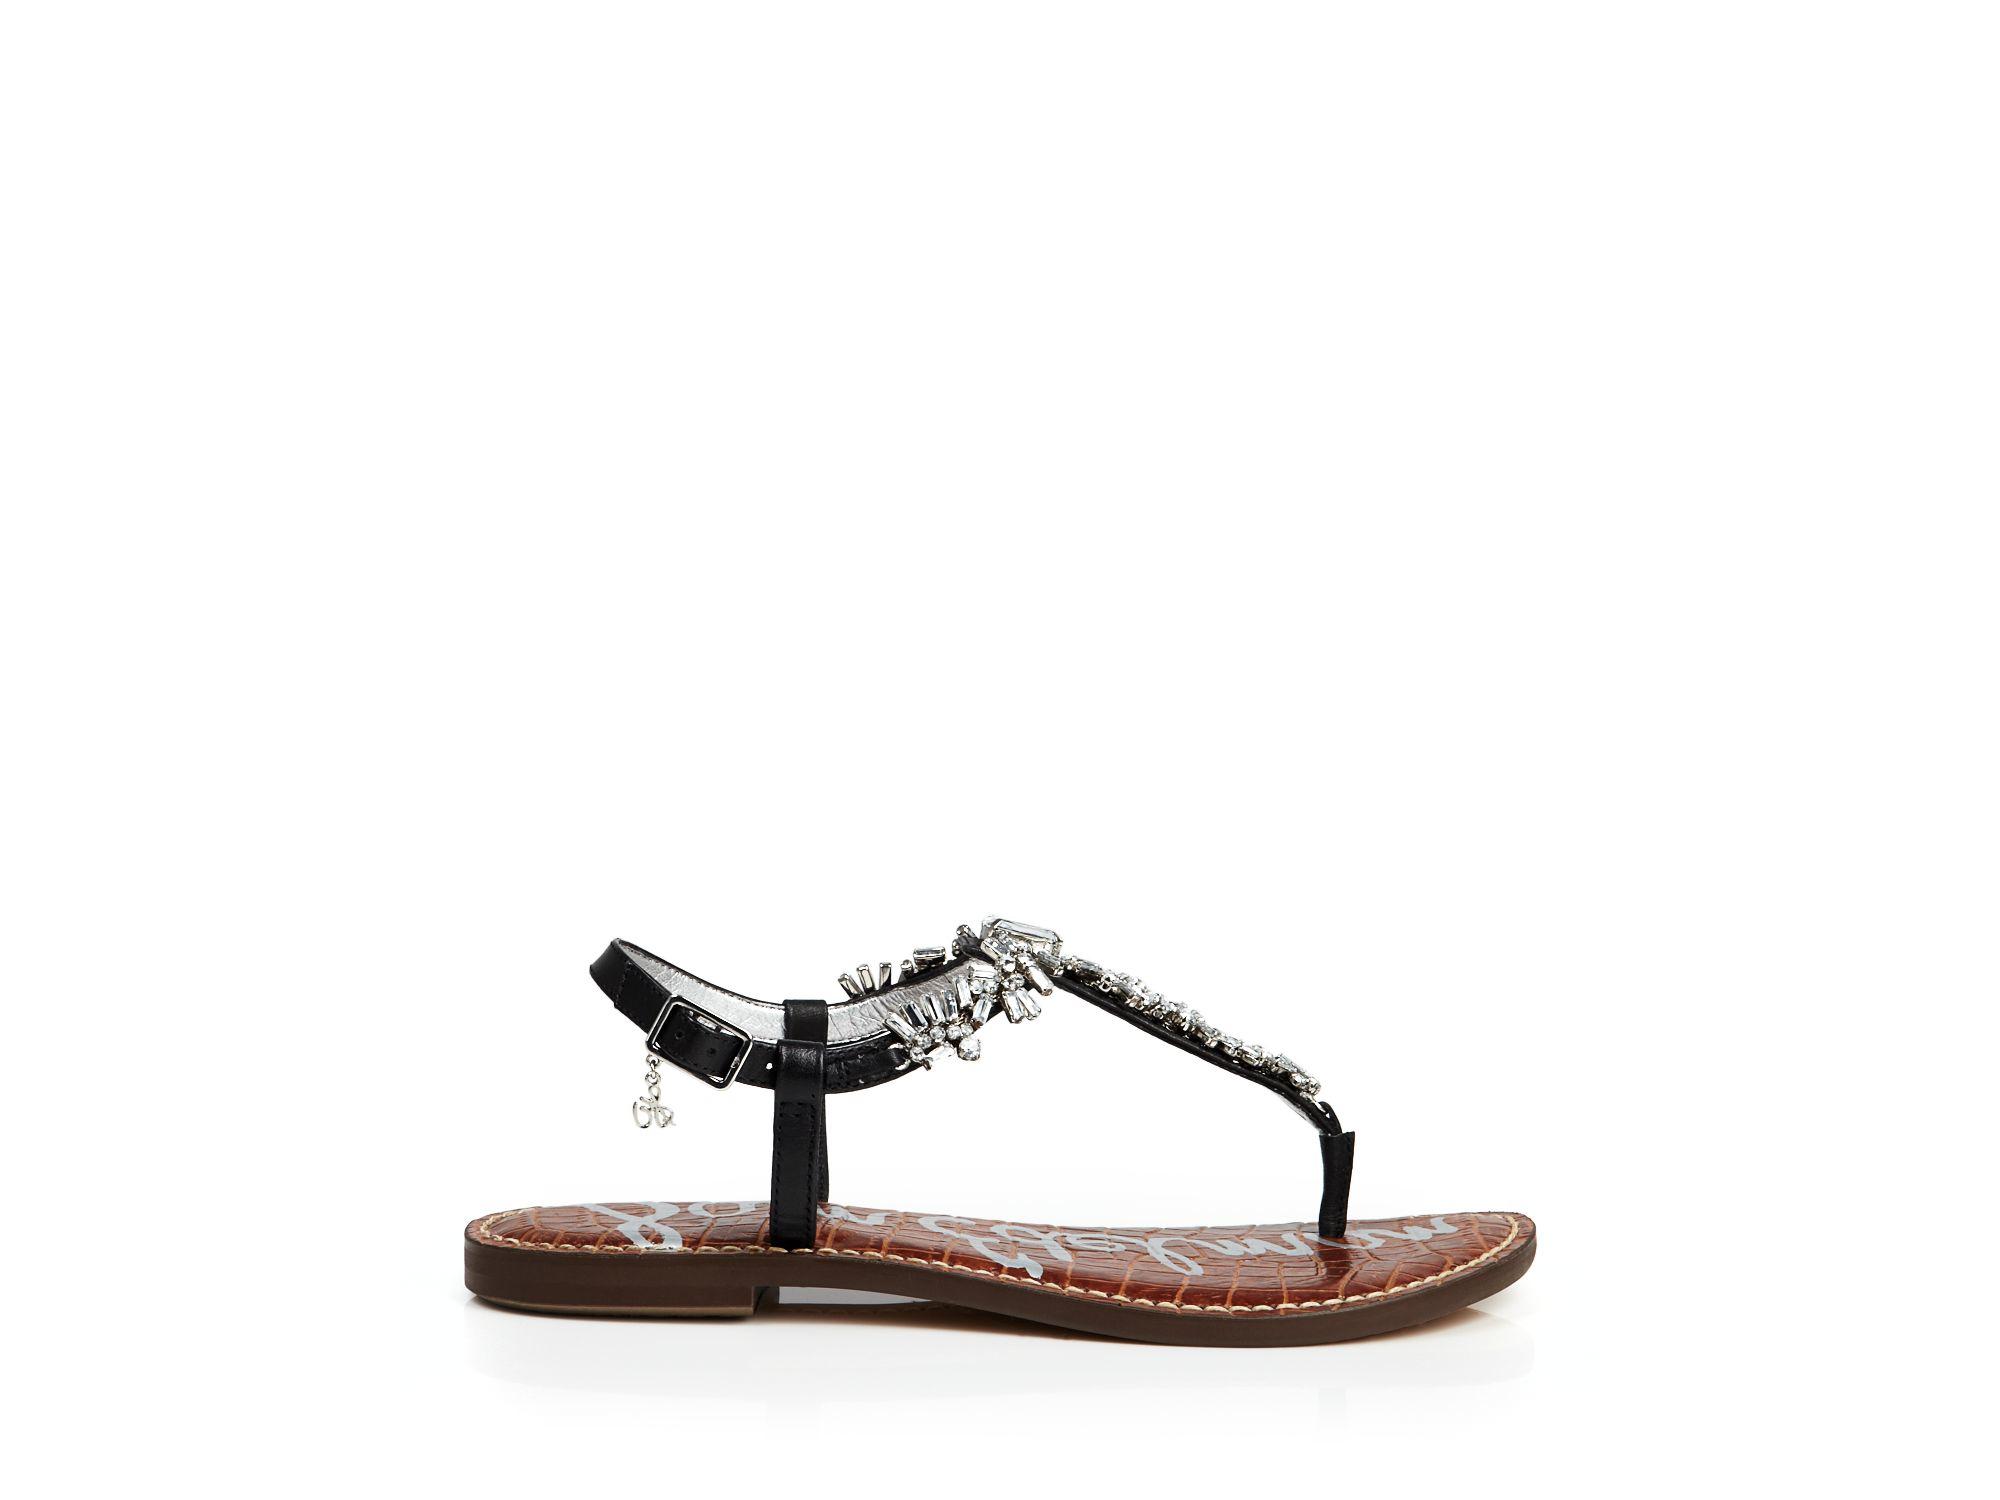 f25c89abc Sam Edelman Flat Thong Sandals - Georgie in Black - Lyst